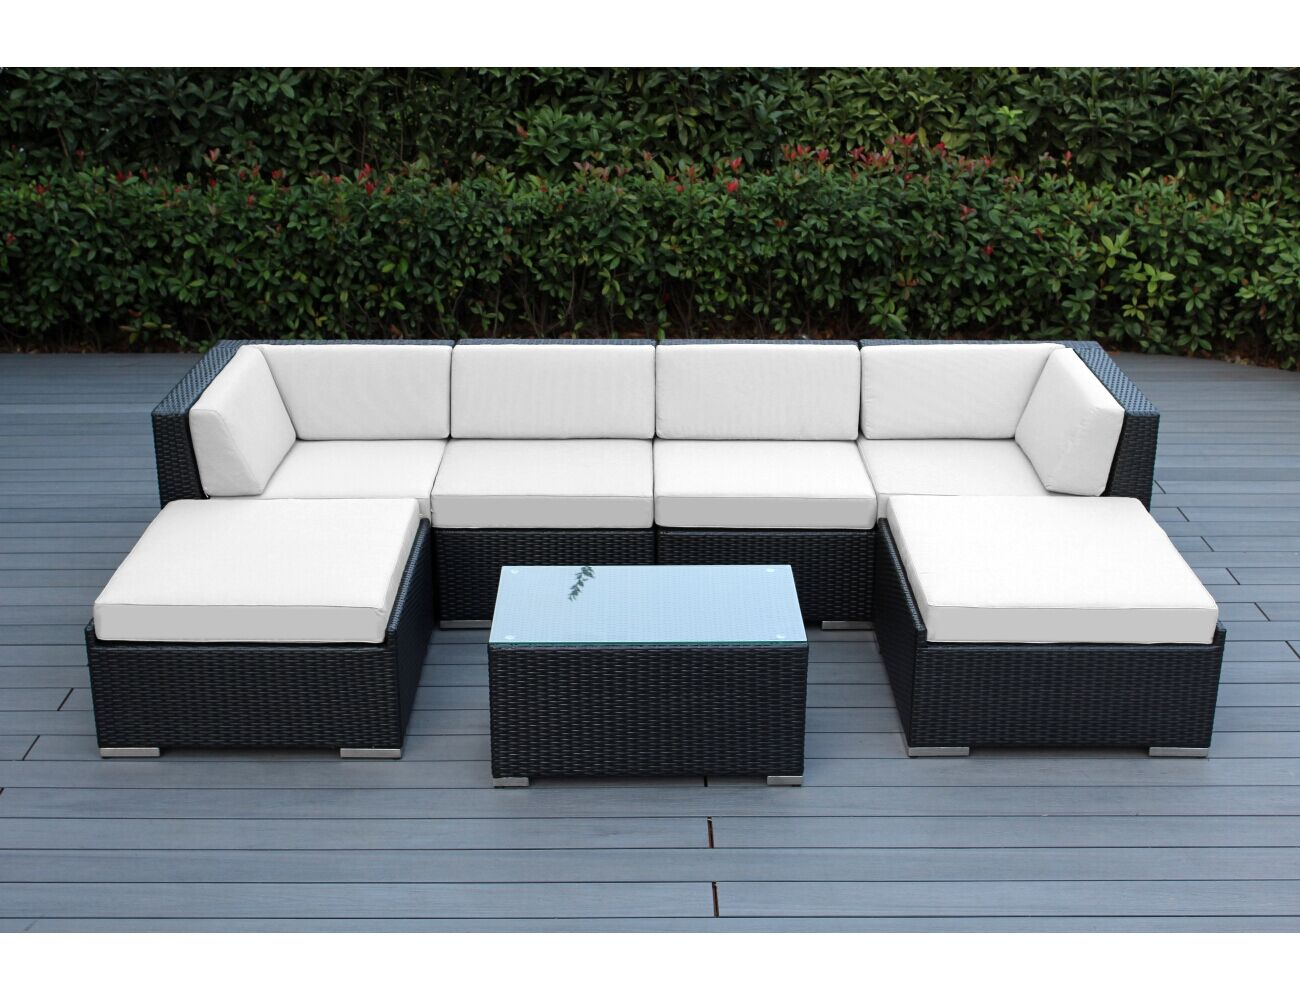 Baril 7 Piece Sofa Set with Cushions Fabric: Sunbrella Natural, Color: Black